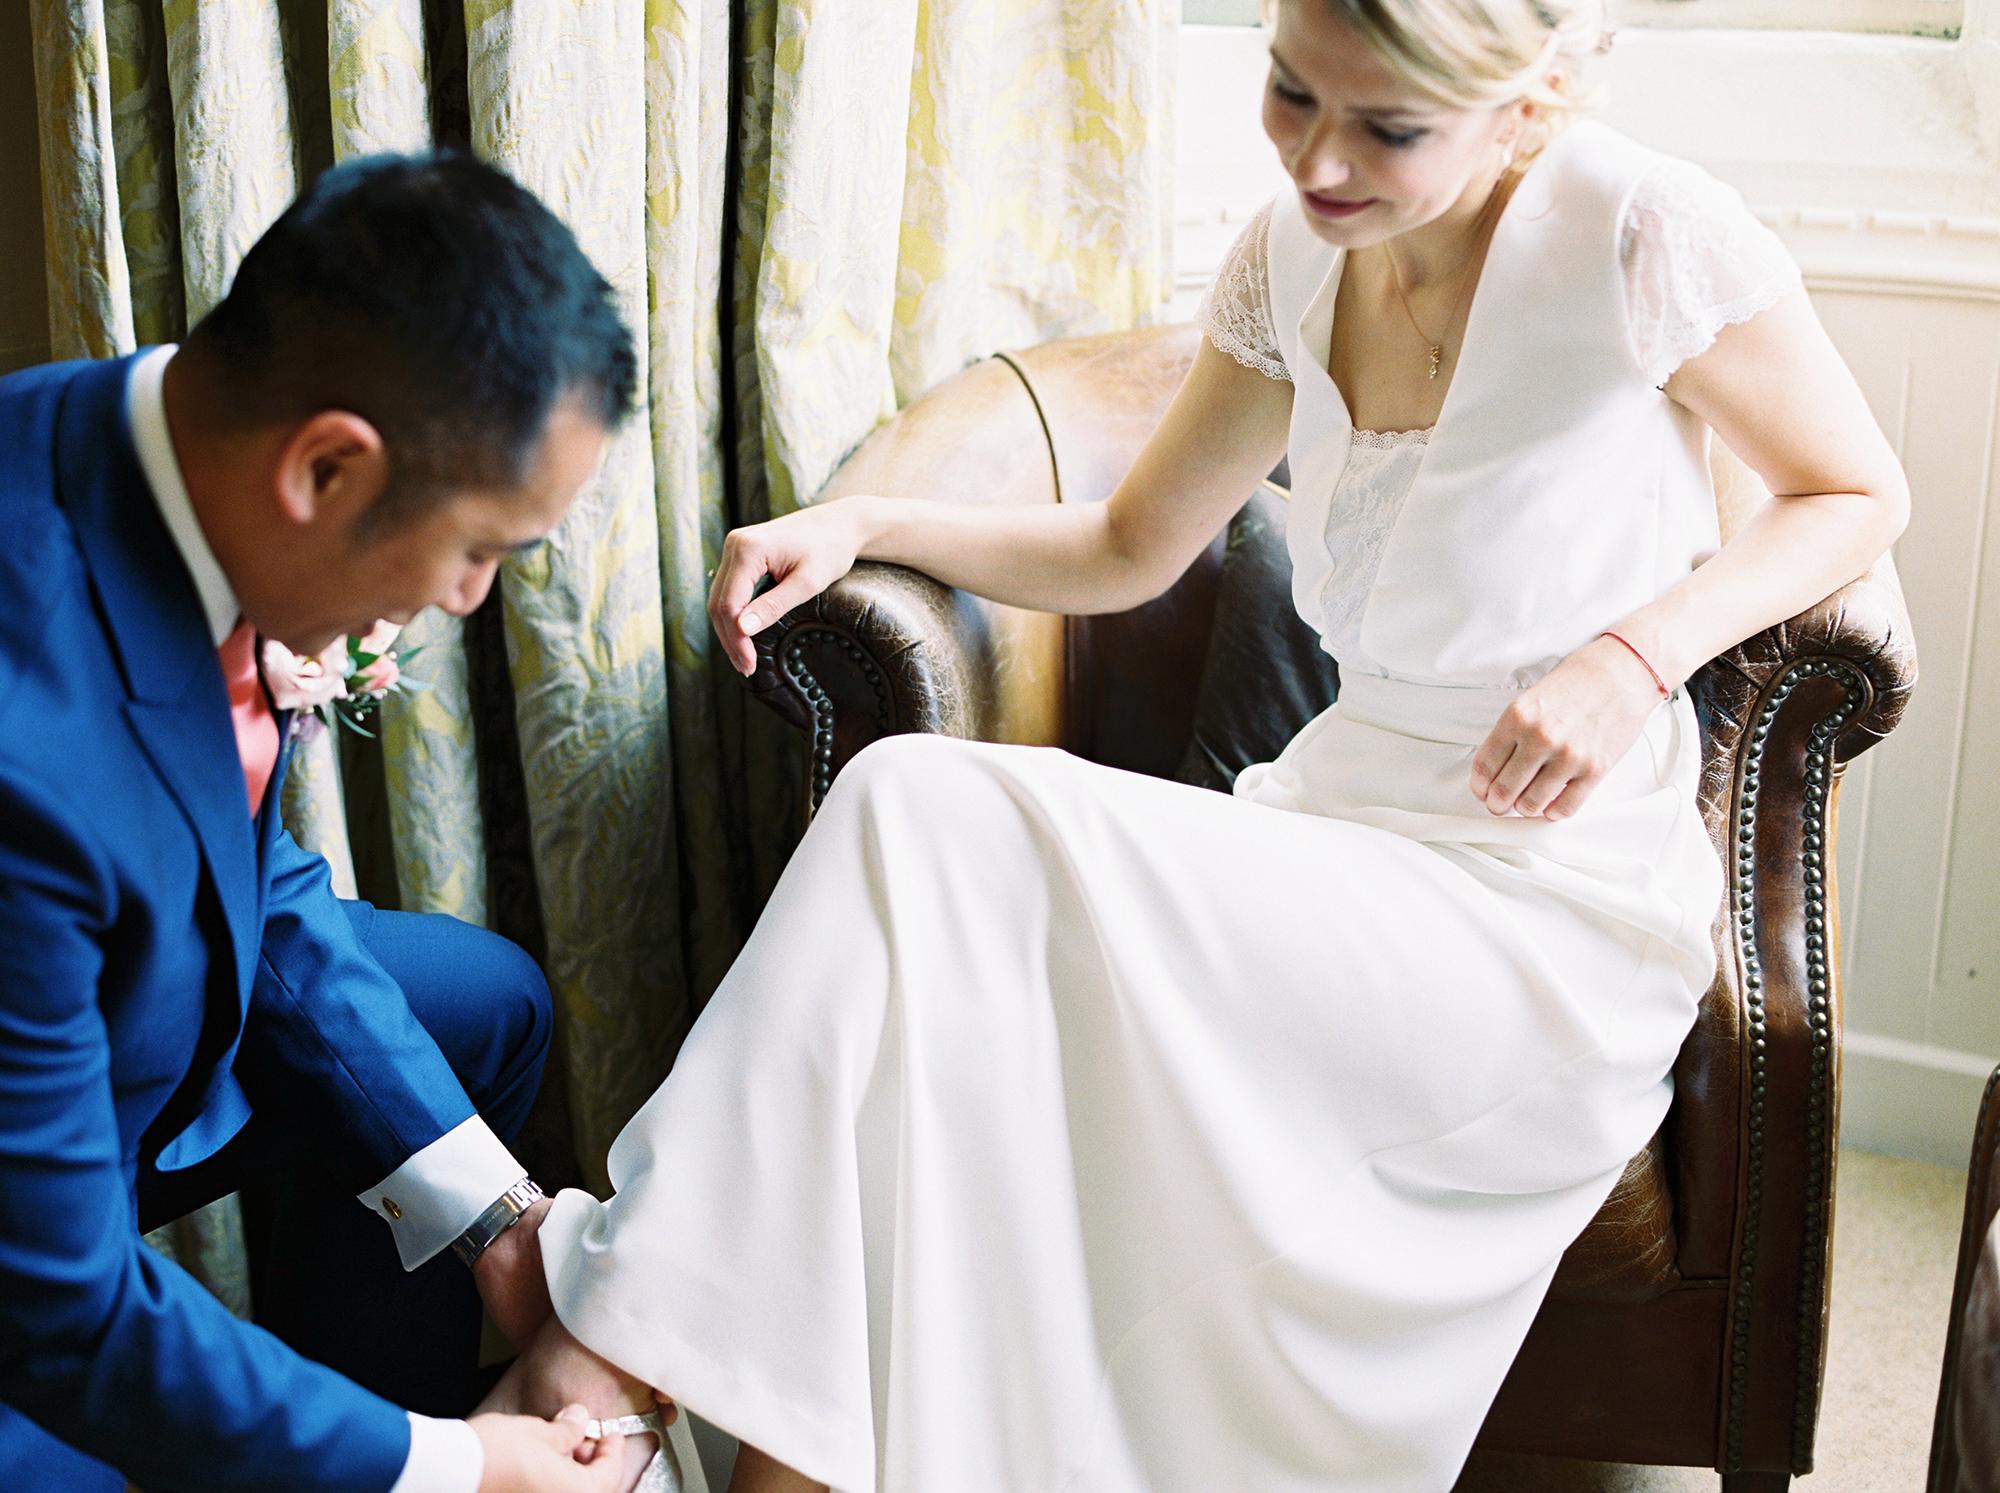 wedding_photographer_cumbria104.jpg